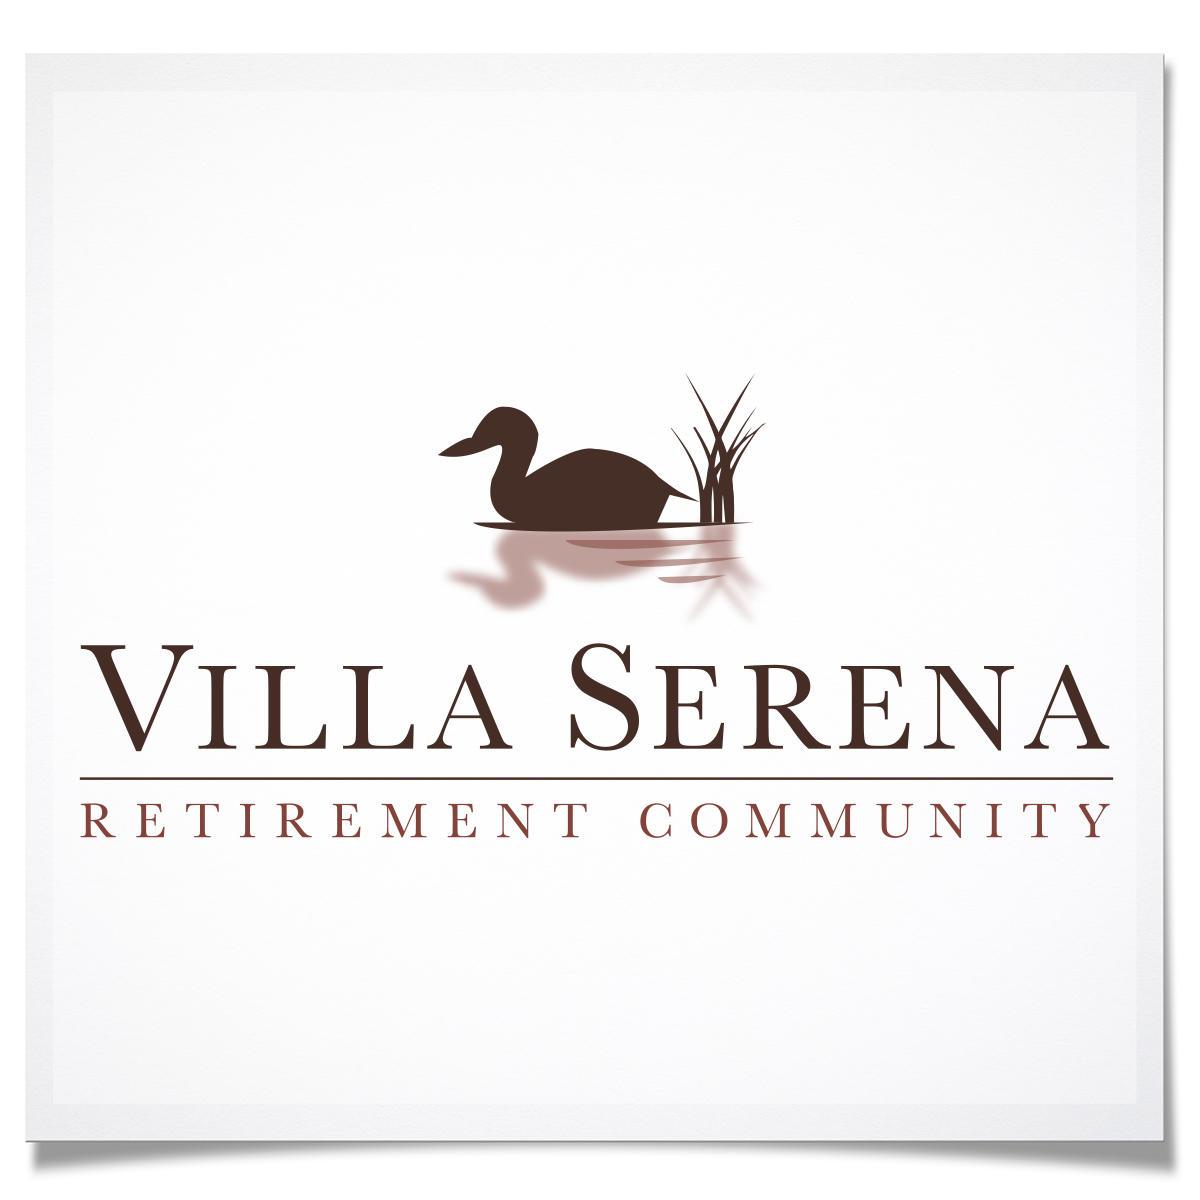 Villa Serena Retirement Community